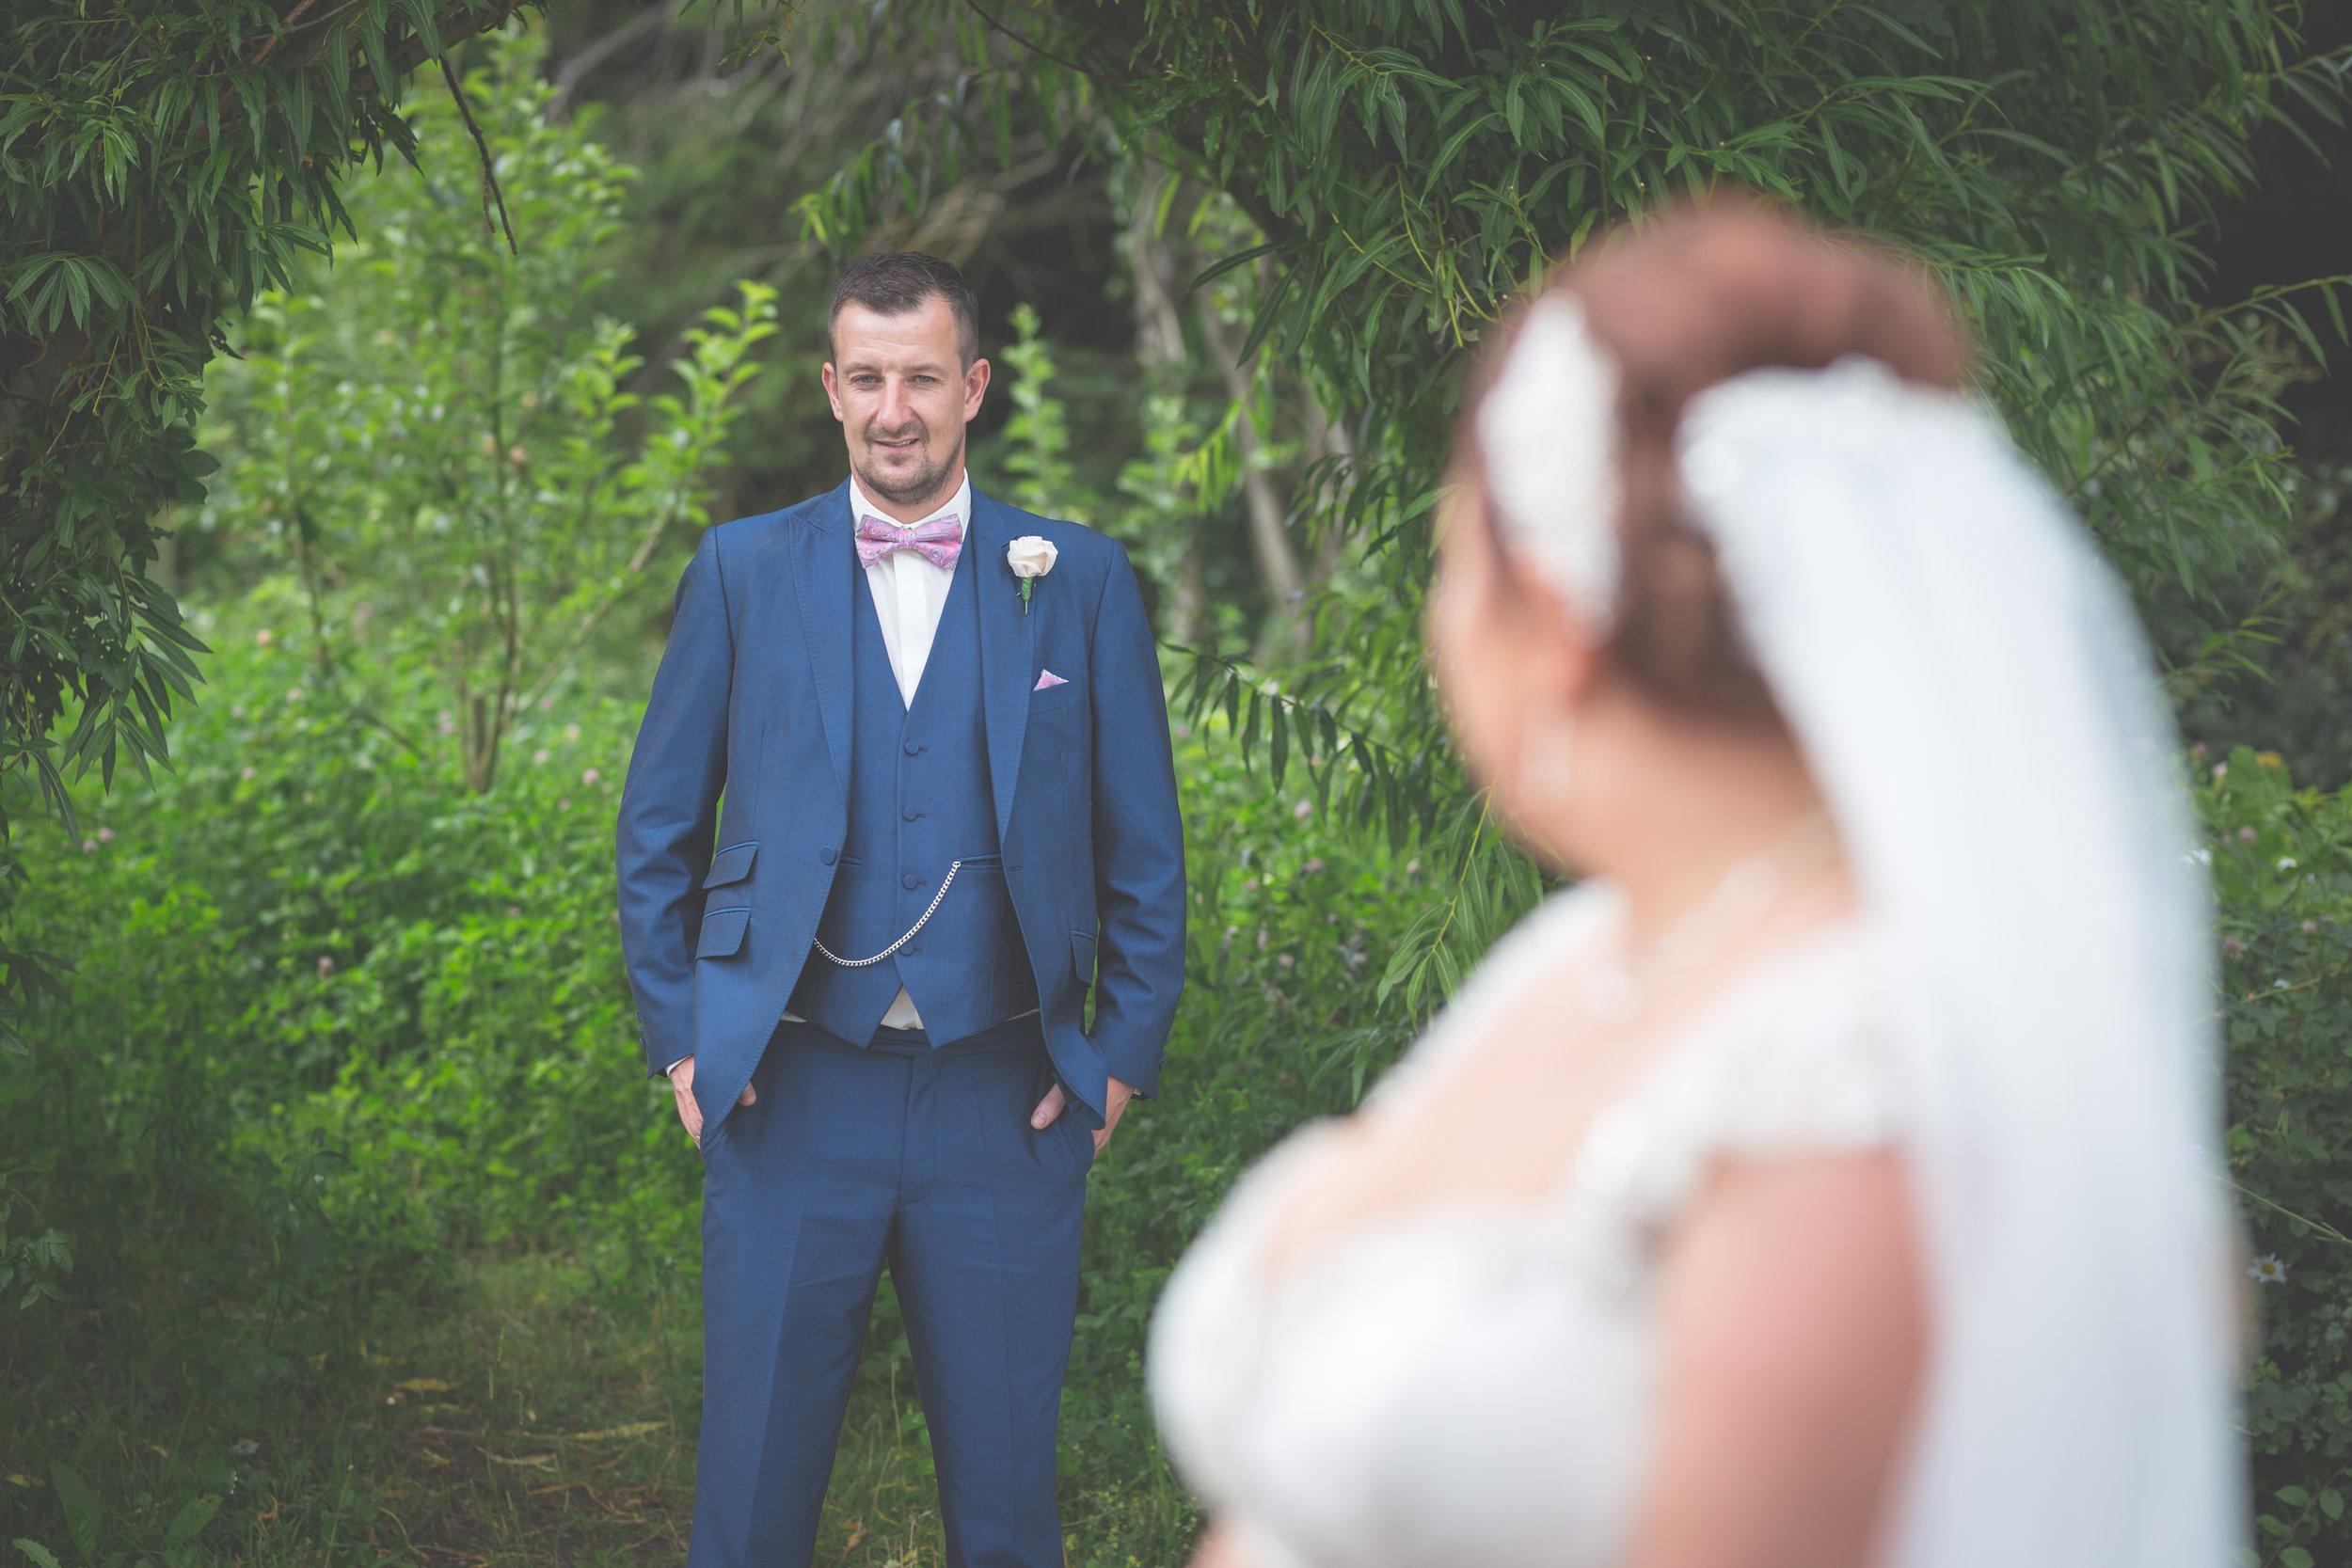 Antoinette & Stephen - Portraits   Brian McEwan Photography   Wedding Photographer Northern Ireland 15.jpg